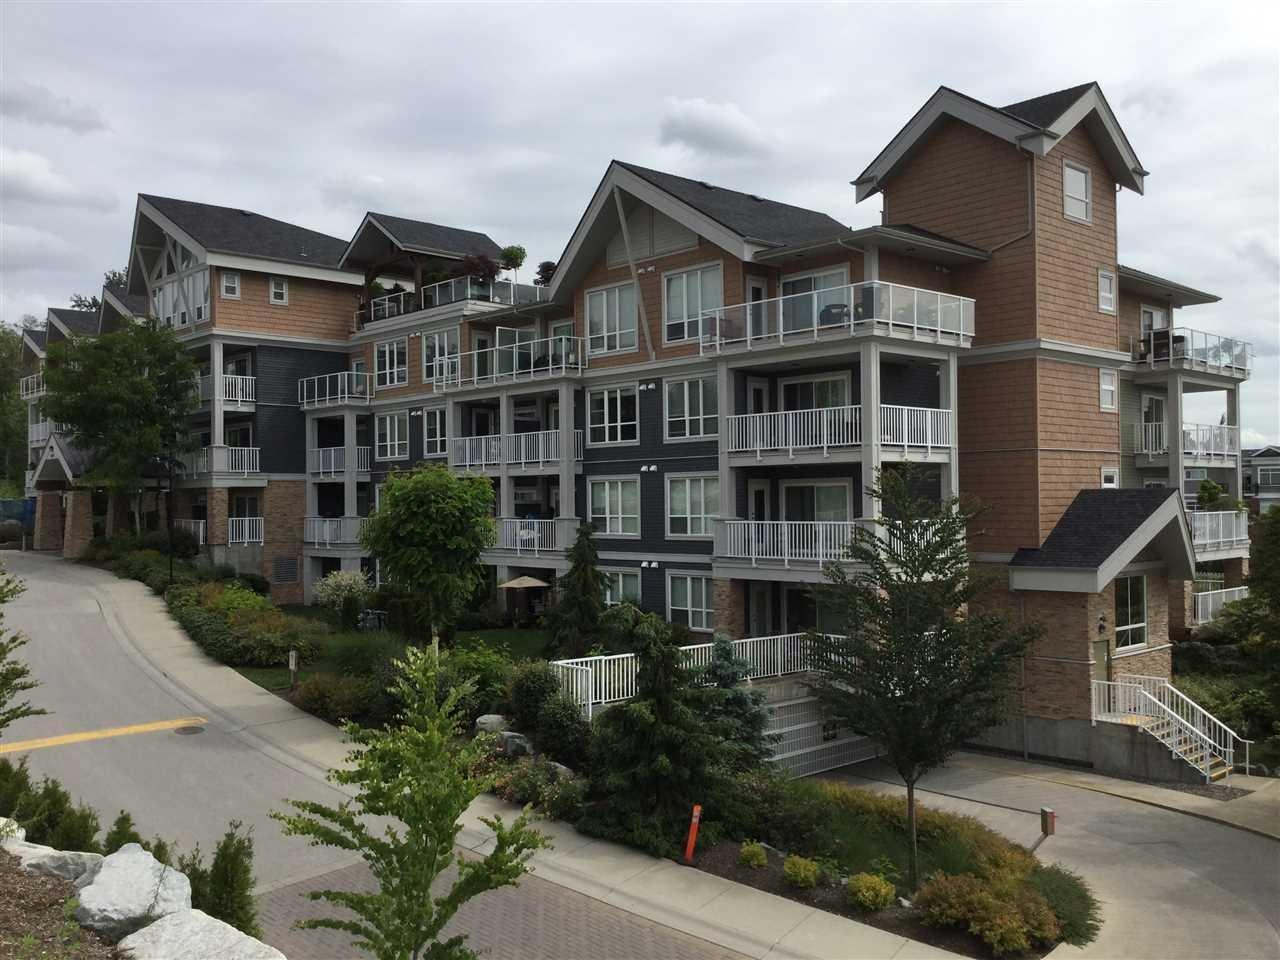 R2070774 - 407 6460 194 STREET, Clayton, Surrey, BC - Apartment Unit